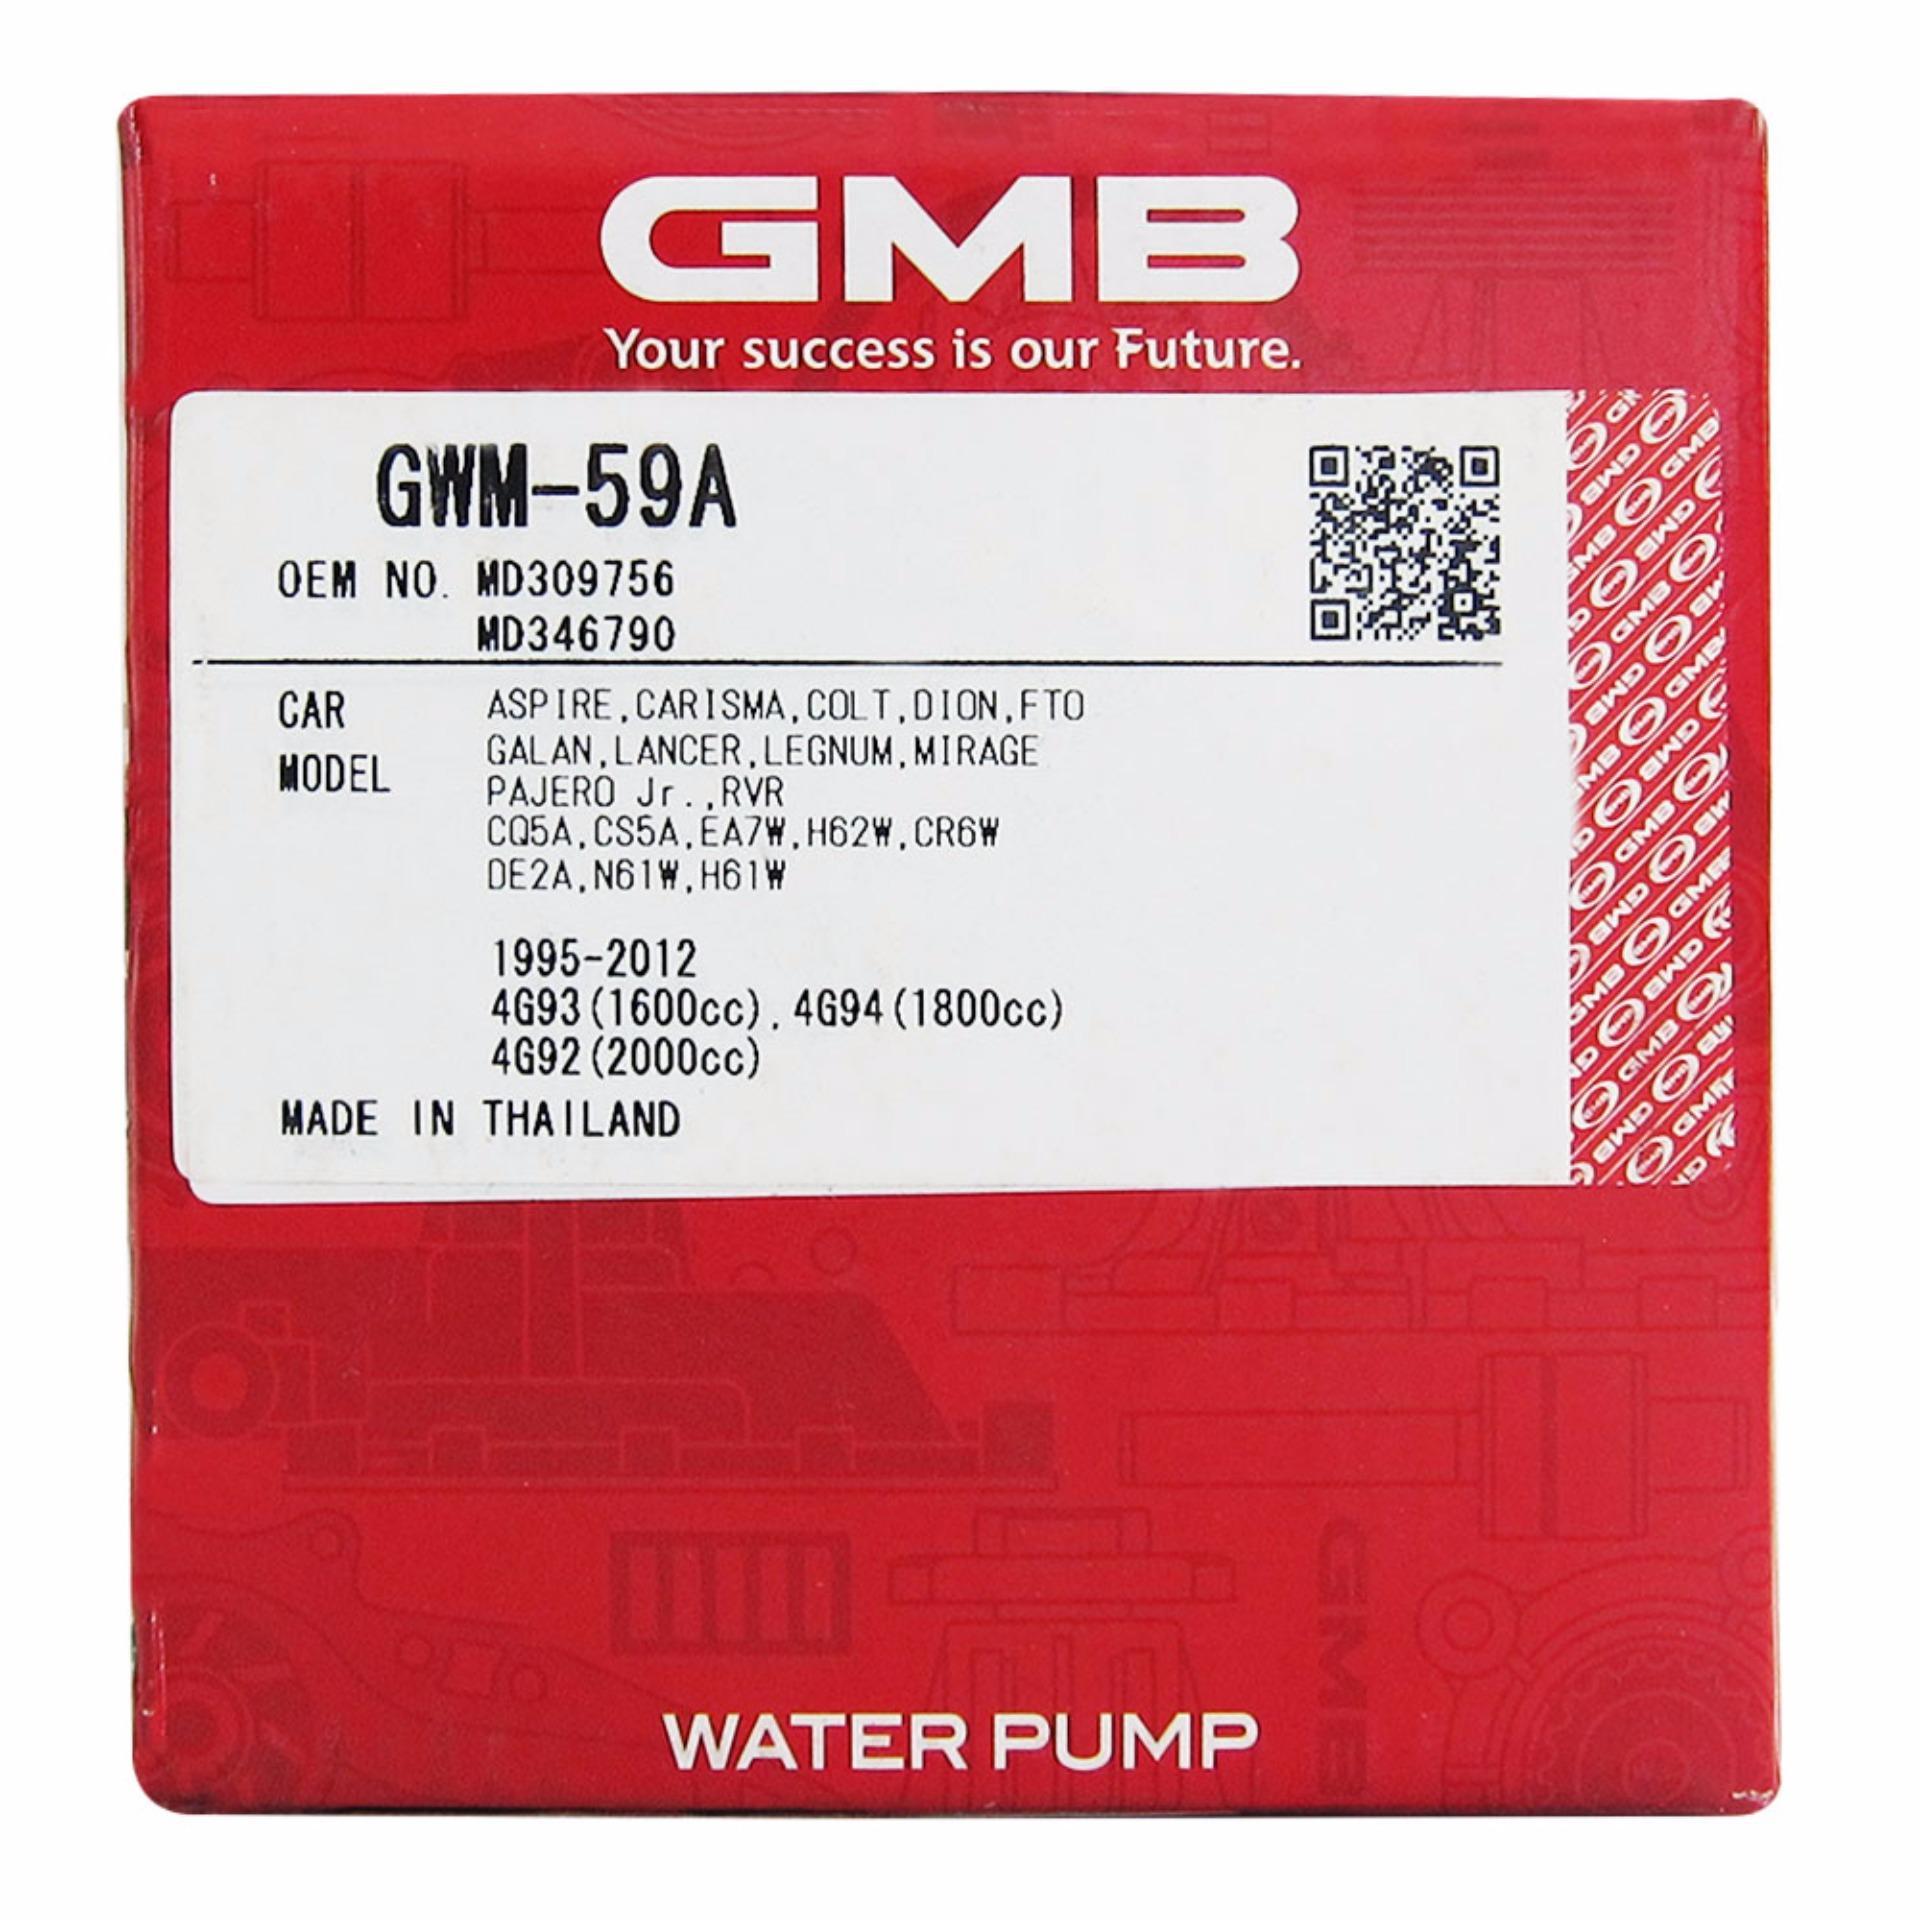 Philippines Water Pump Gmb Gwm 59a For Mitsubishi Lancer Galant Miragepajero Jr